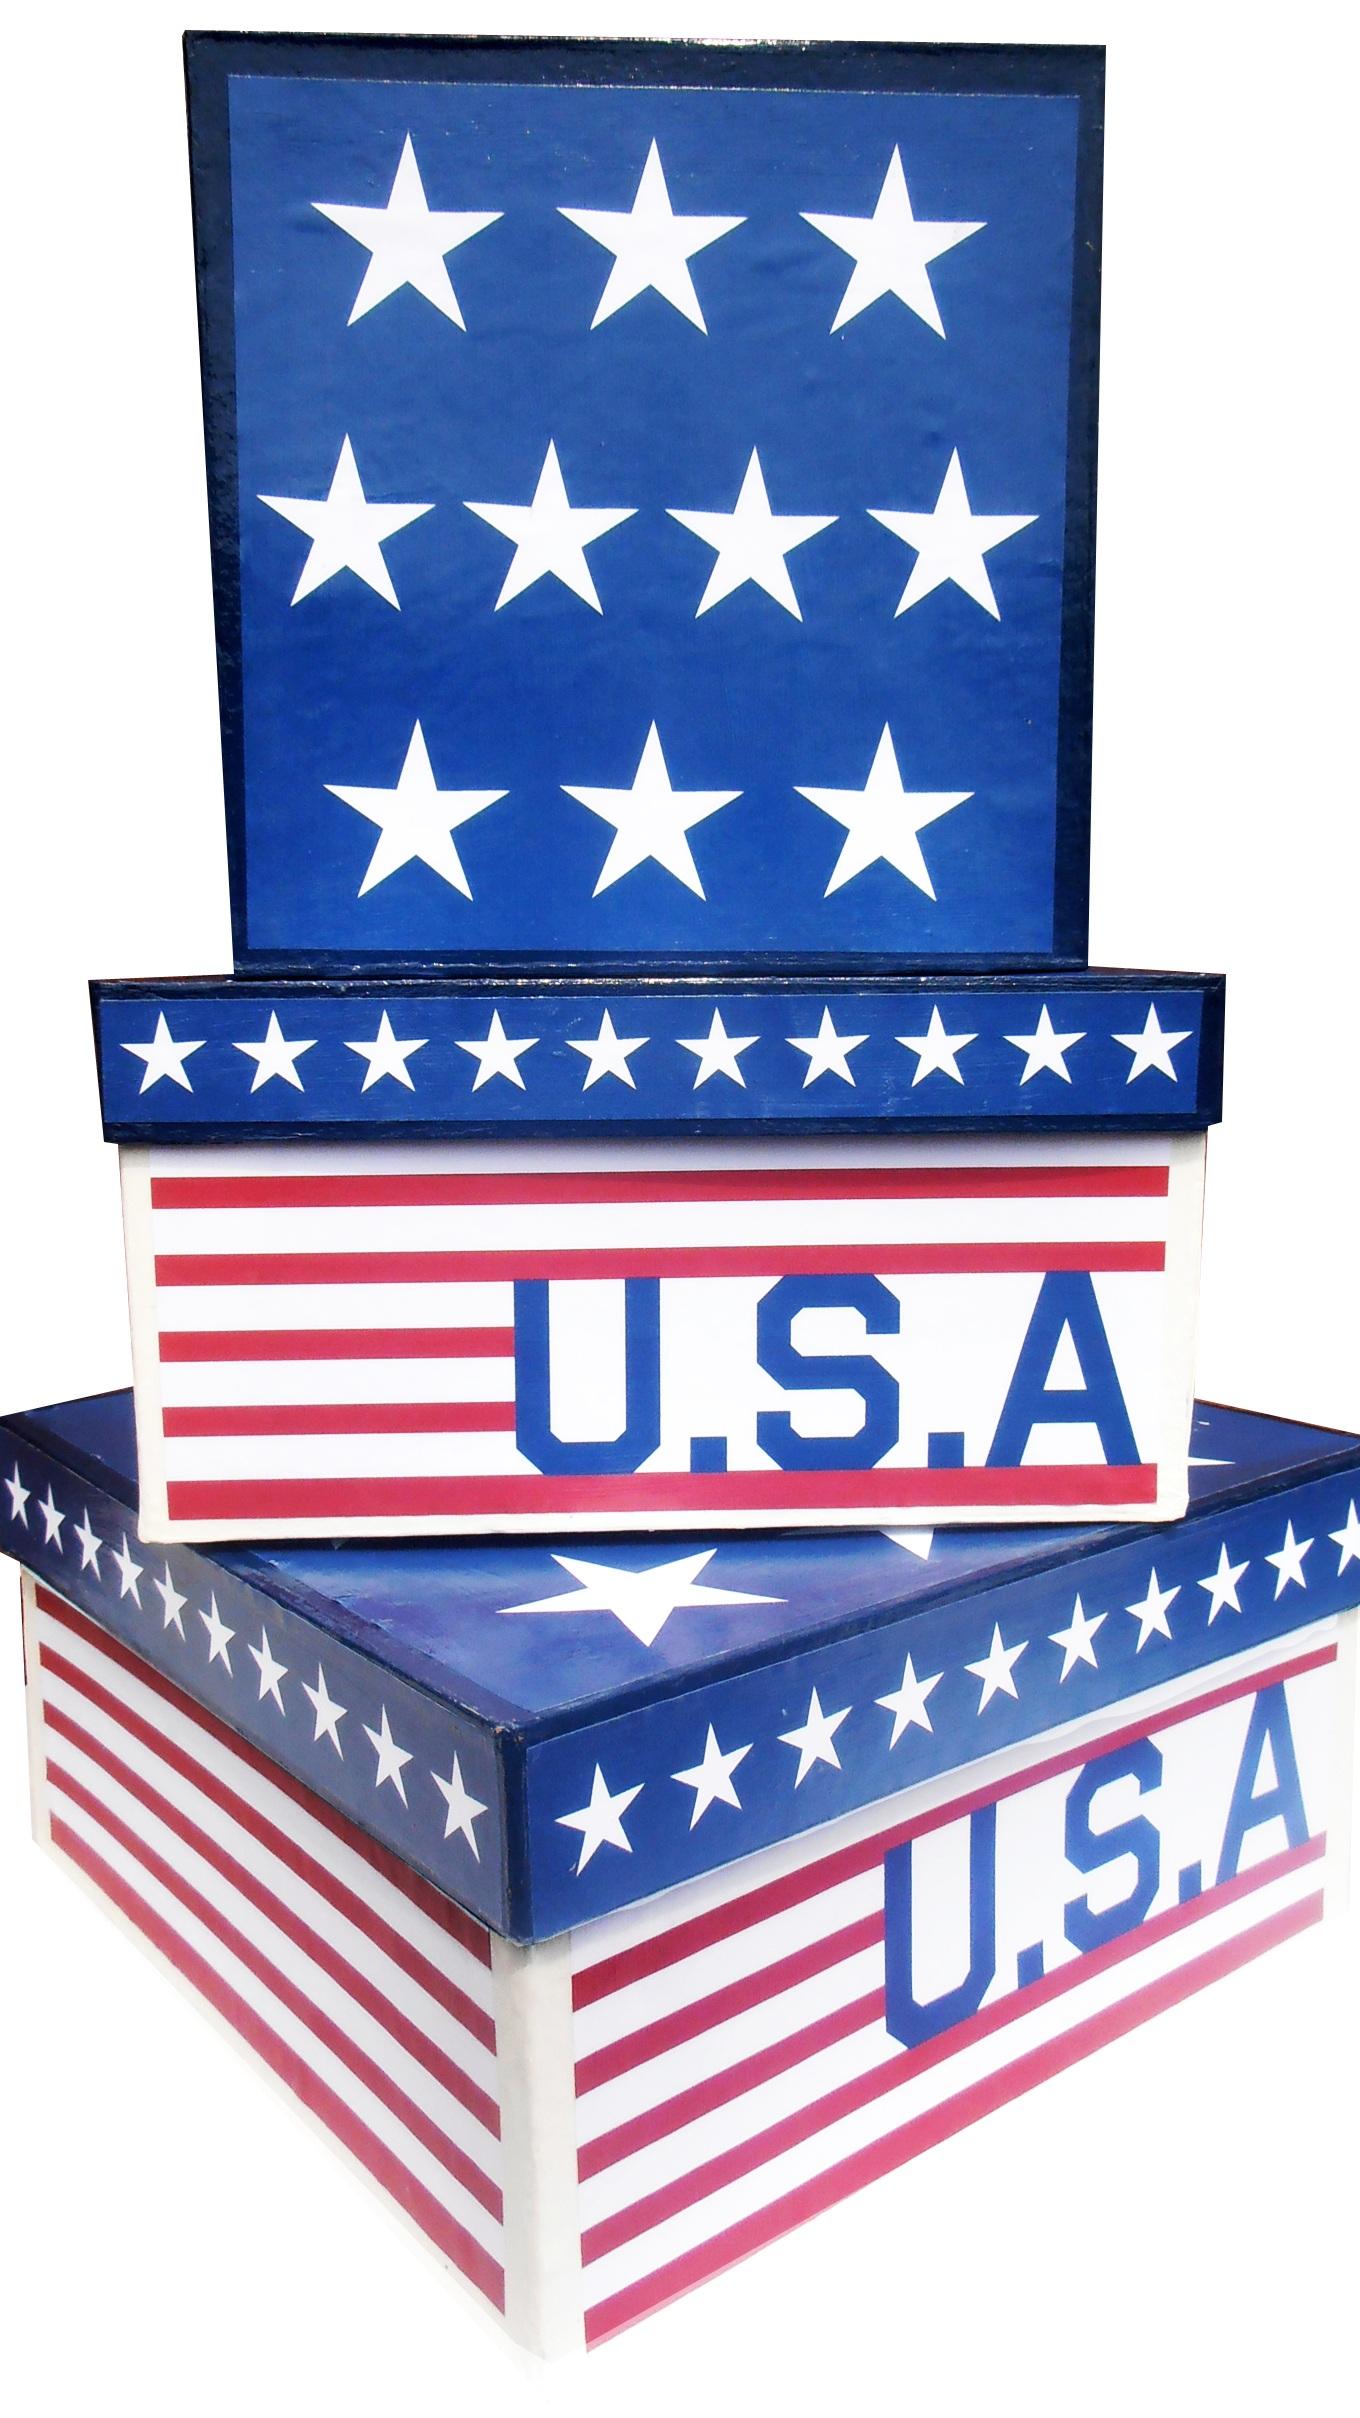 USA+stack2.jpg